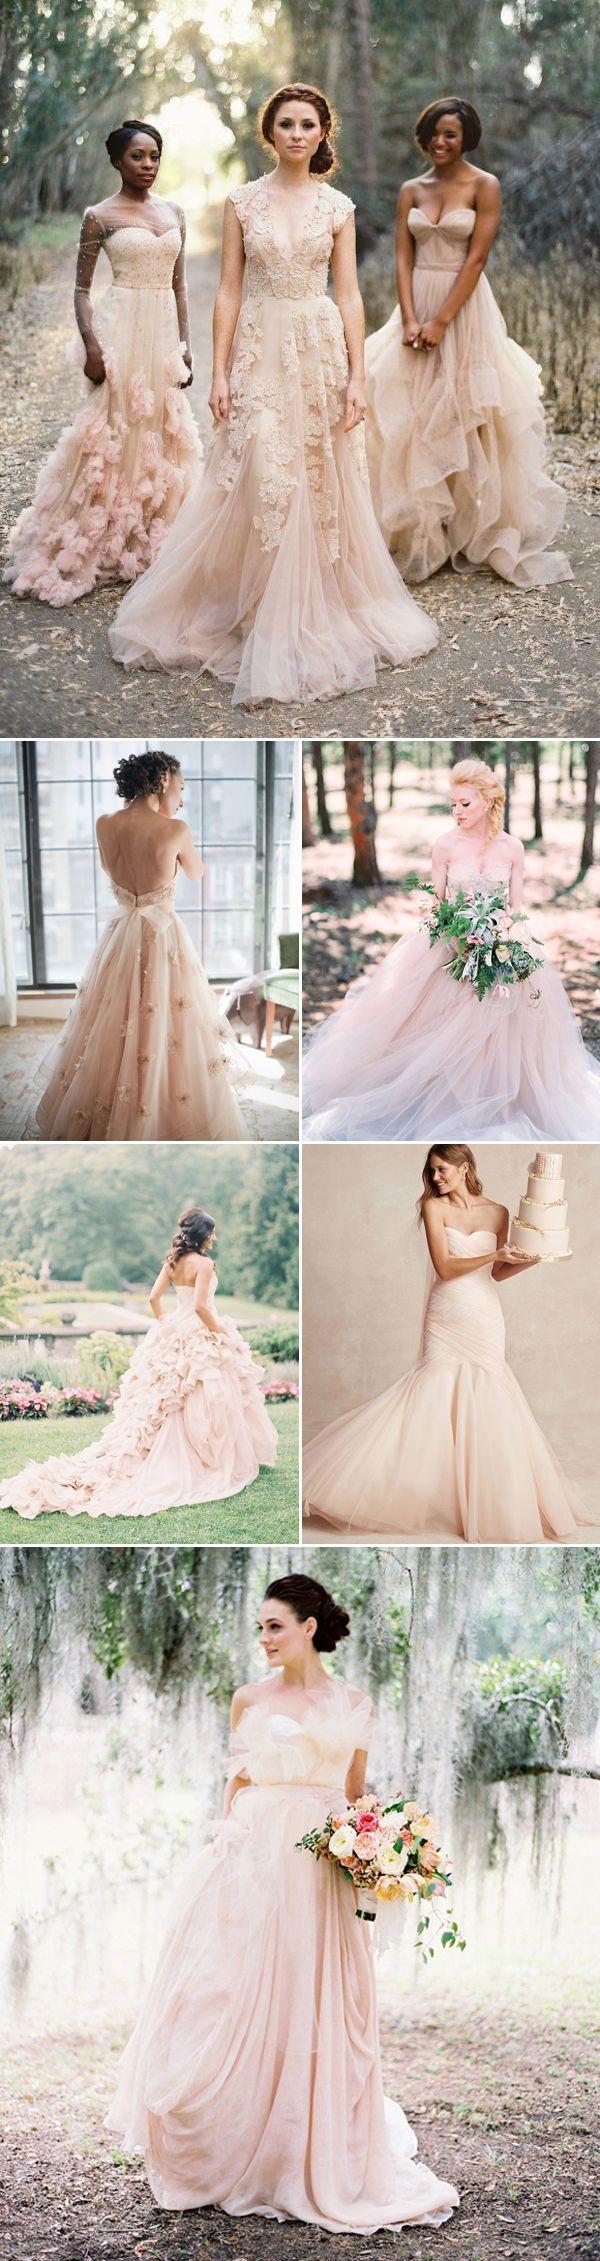 20 Utterly Romantic Blush Wedding Dresses Praise Wedding Wedding Dresses Blush Wedding Dresses Whimsical Pink Wedding Dresses